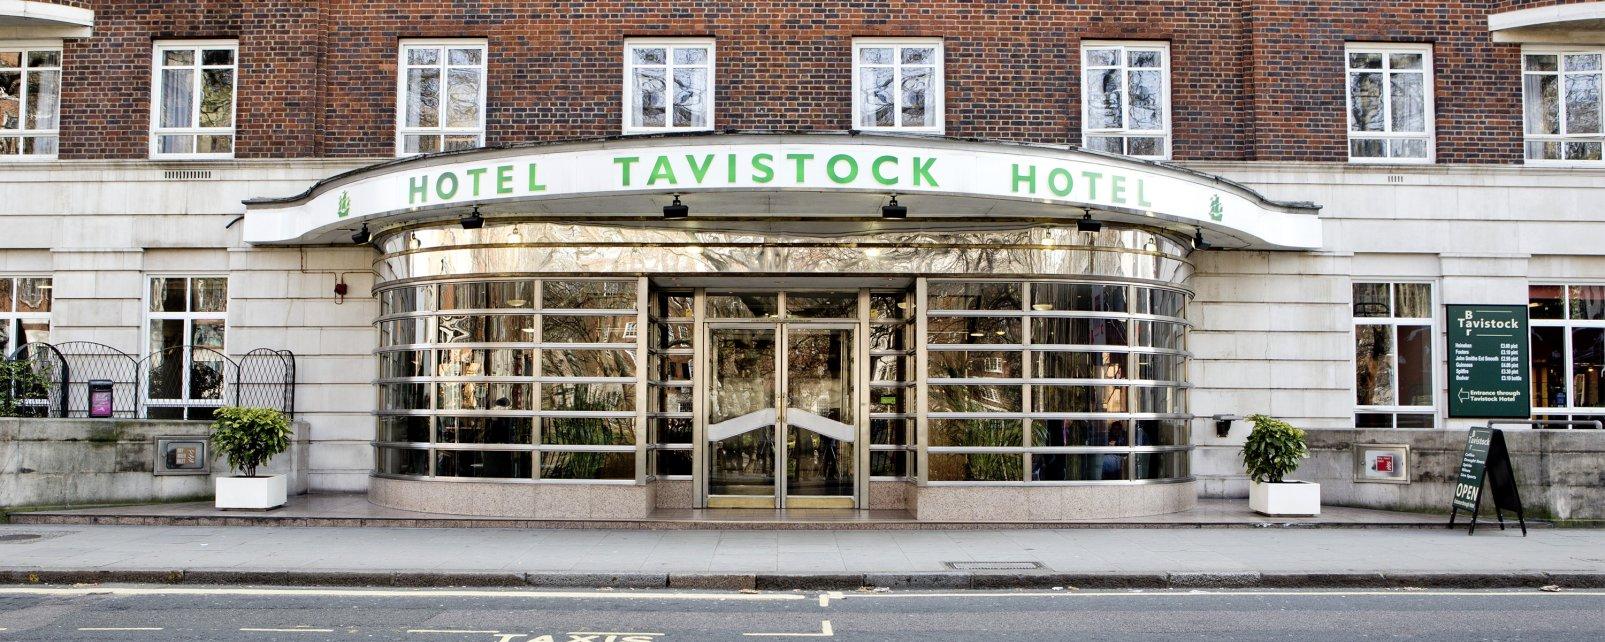 Hotel Tavistock Hotel In London United Kingdom